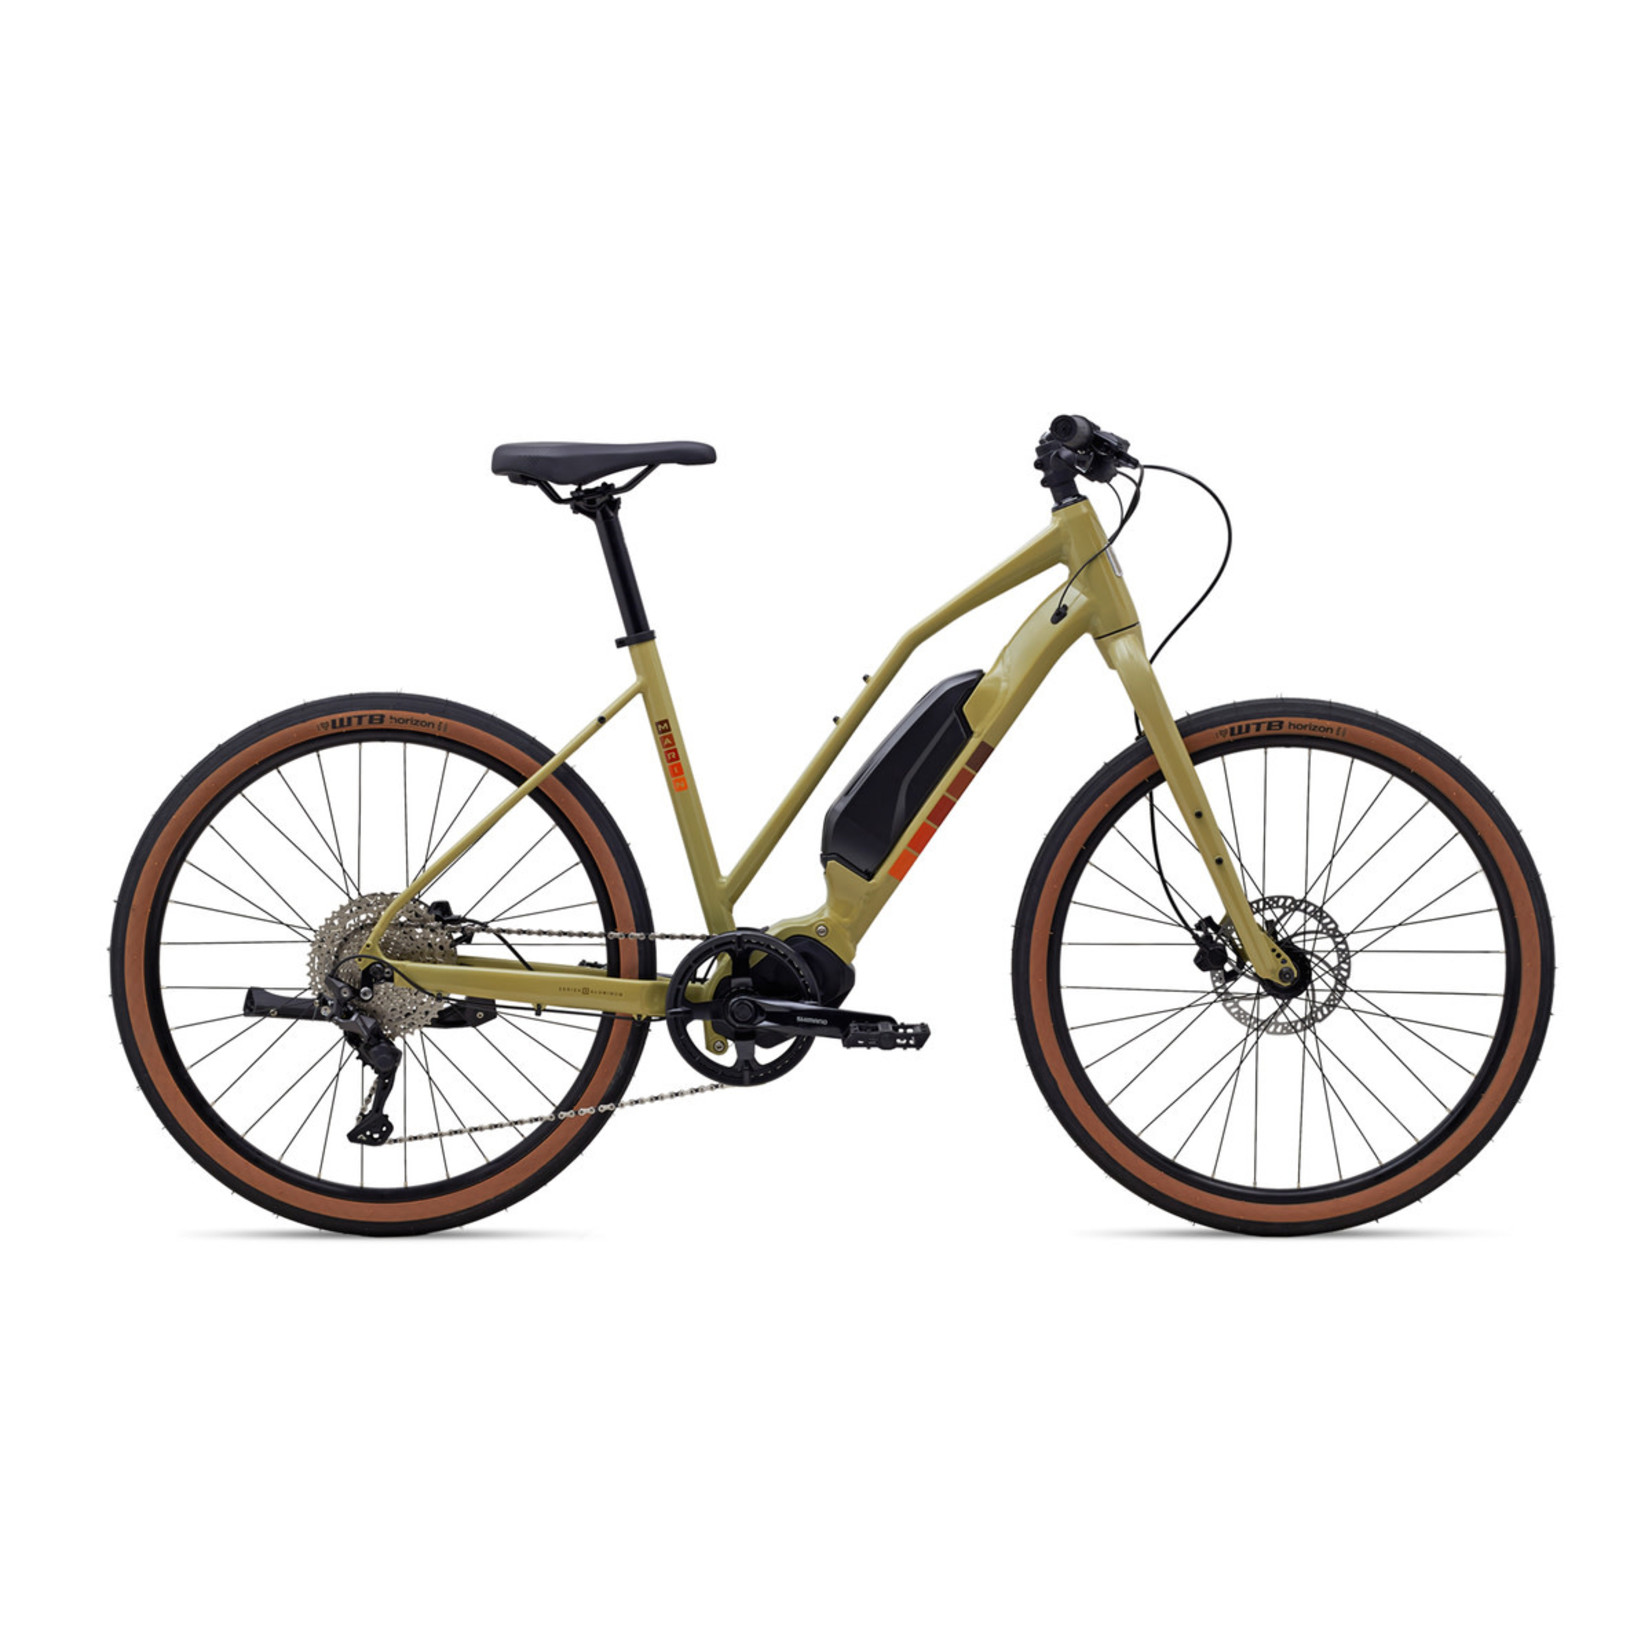 Marin Bikes Marin Sausalito E1 Step Through (2022)